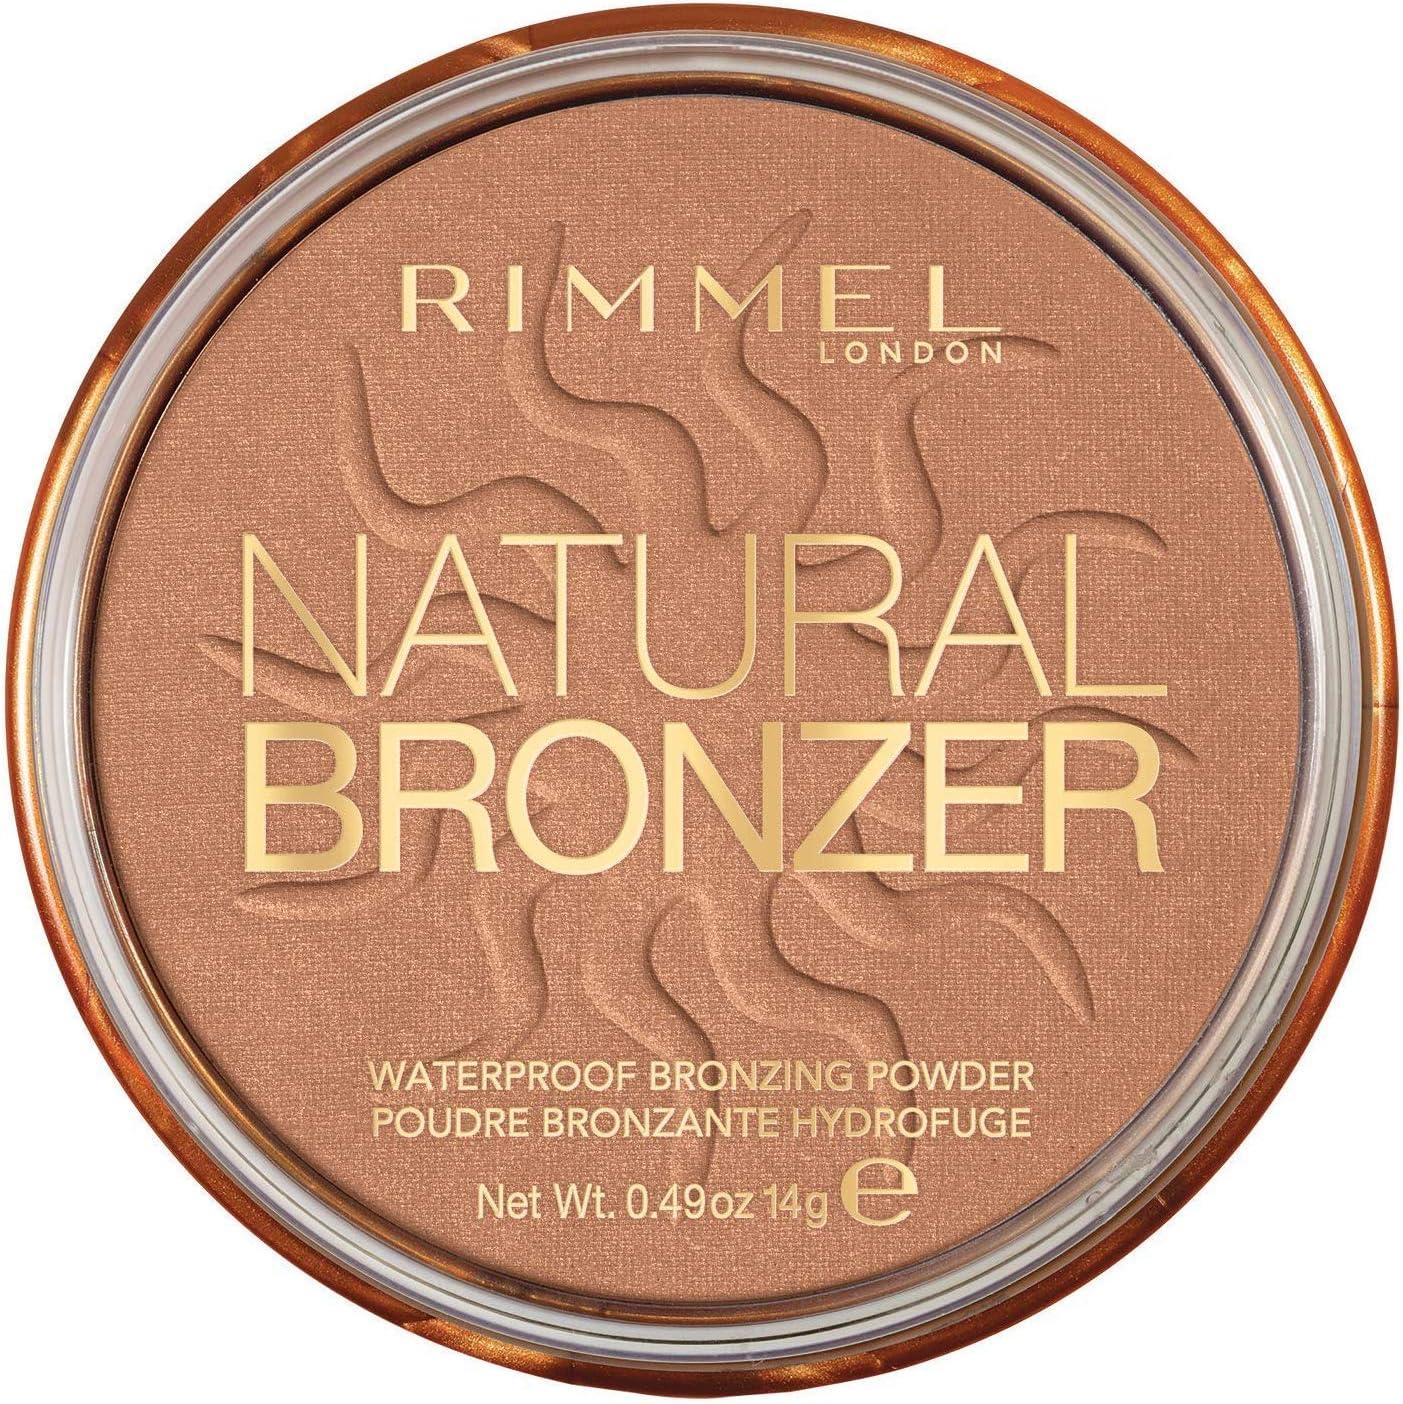 Rimmel London – Natural Bronzer – Polvos bronceadora, marrón, pack de 2: Amazon.es: Belleza